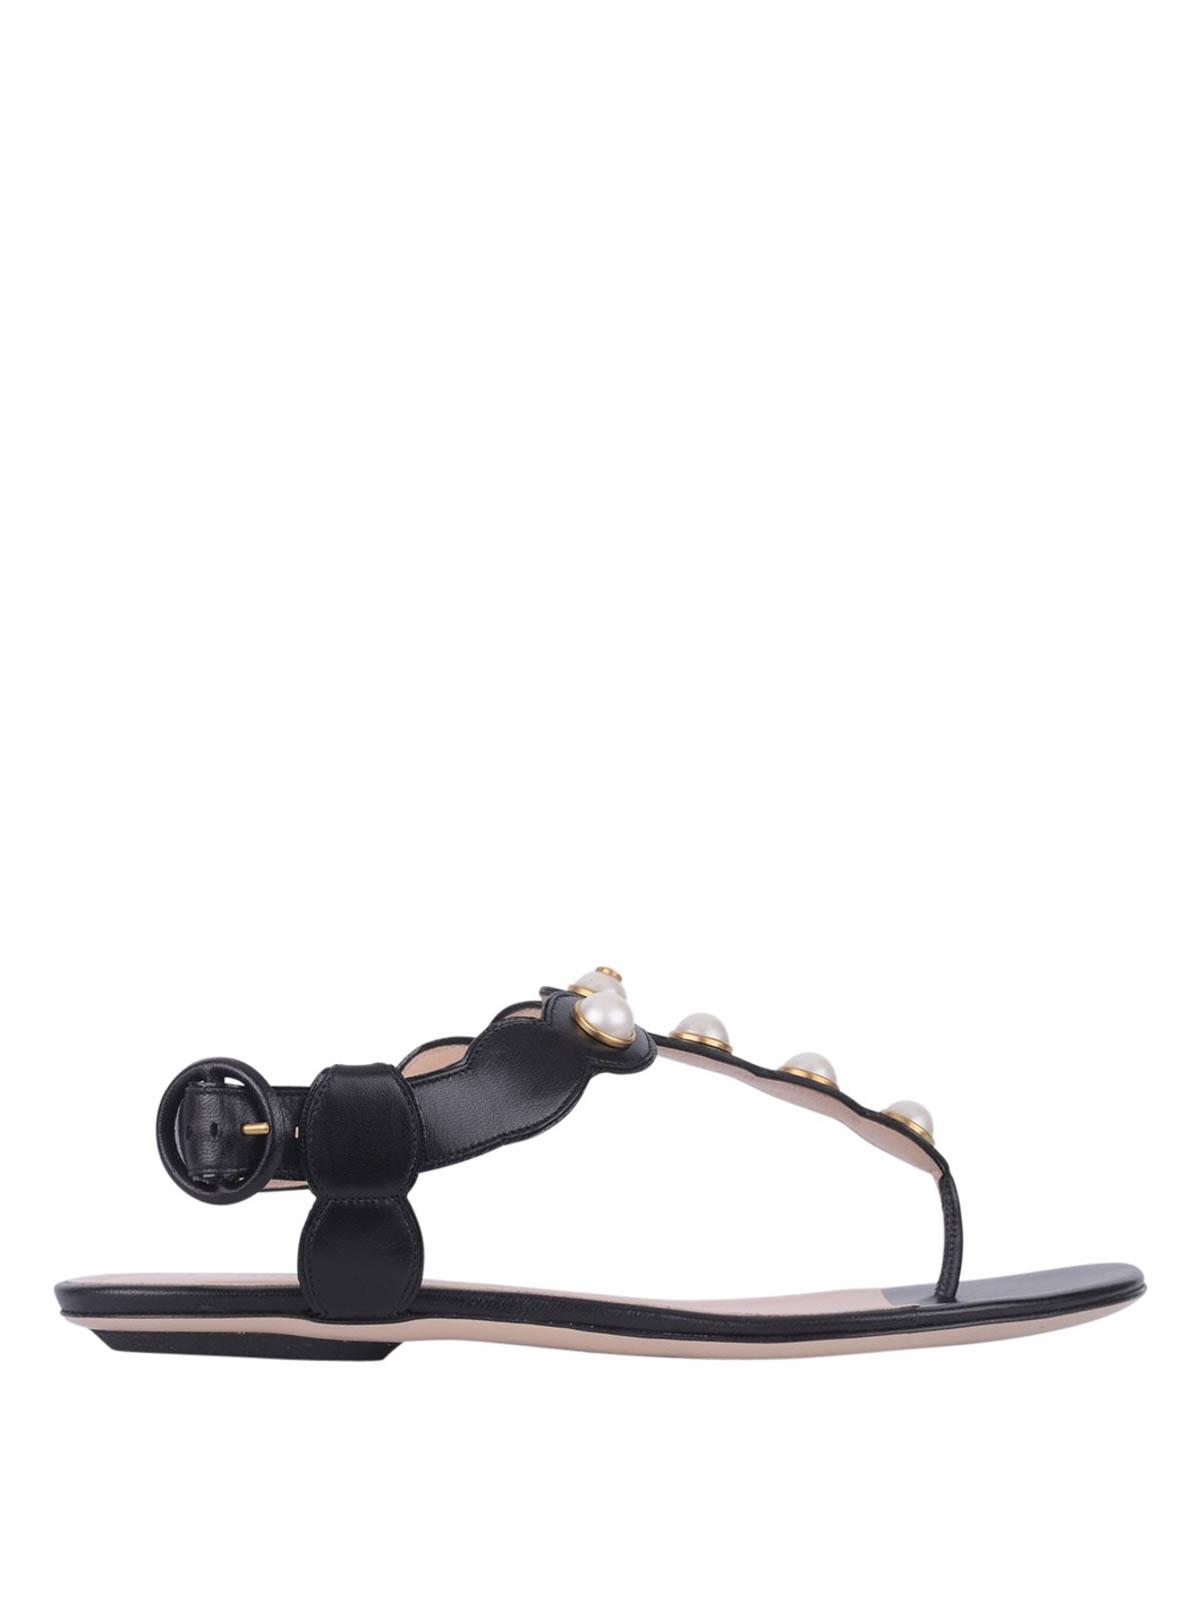 00967e88016f Gucci - Pearl embellished flat sandals - sandals - 424085 C9D00 1000